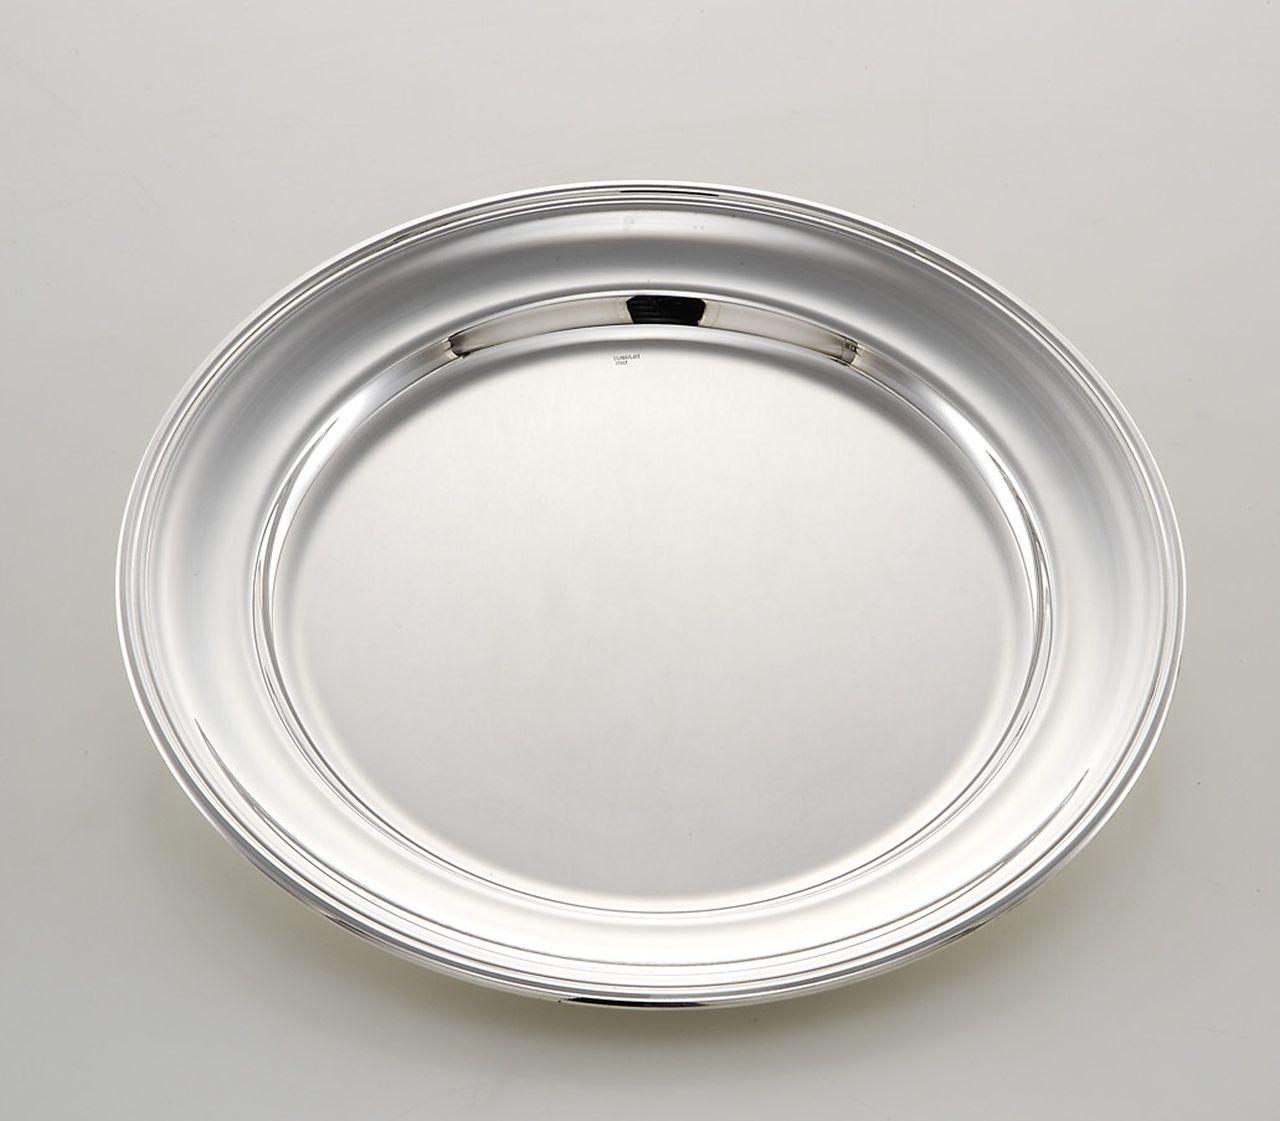 Piatto tondo portata stile Inglese argentato argento sheffield cm.diam.30